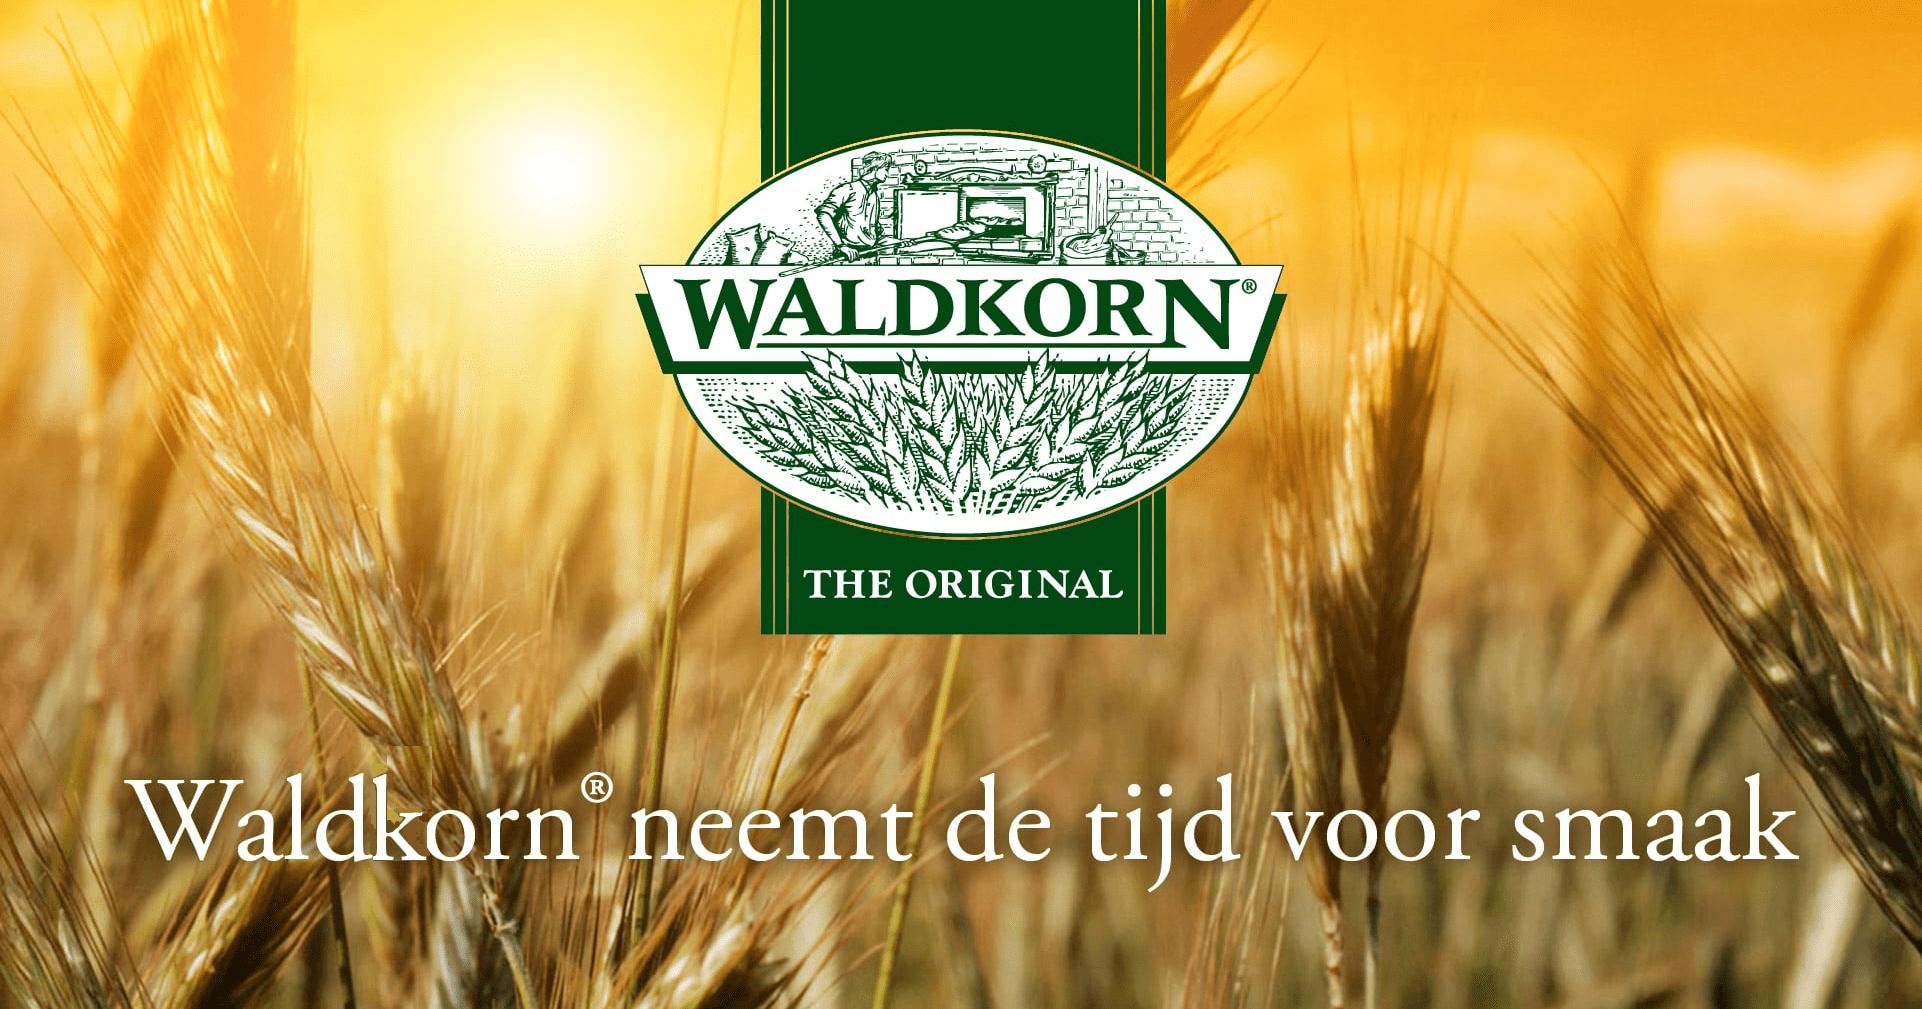 waldkorn, Bakery, Amsterdam, sandwiches, Sweet